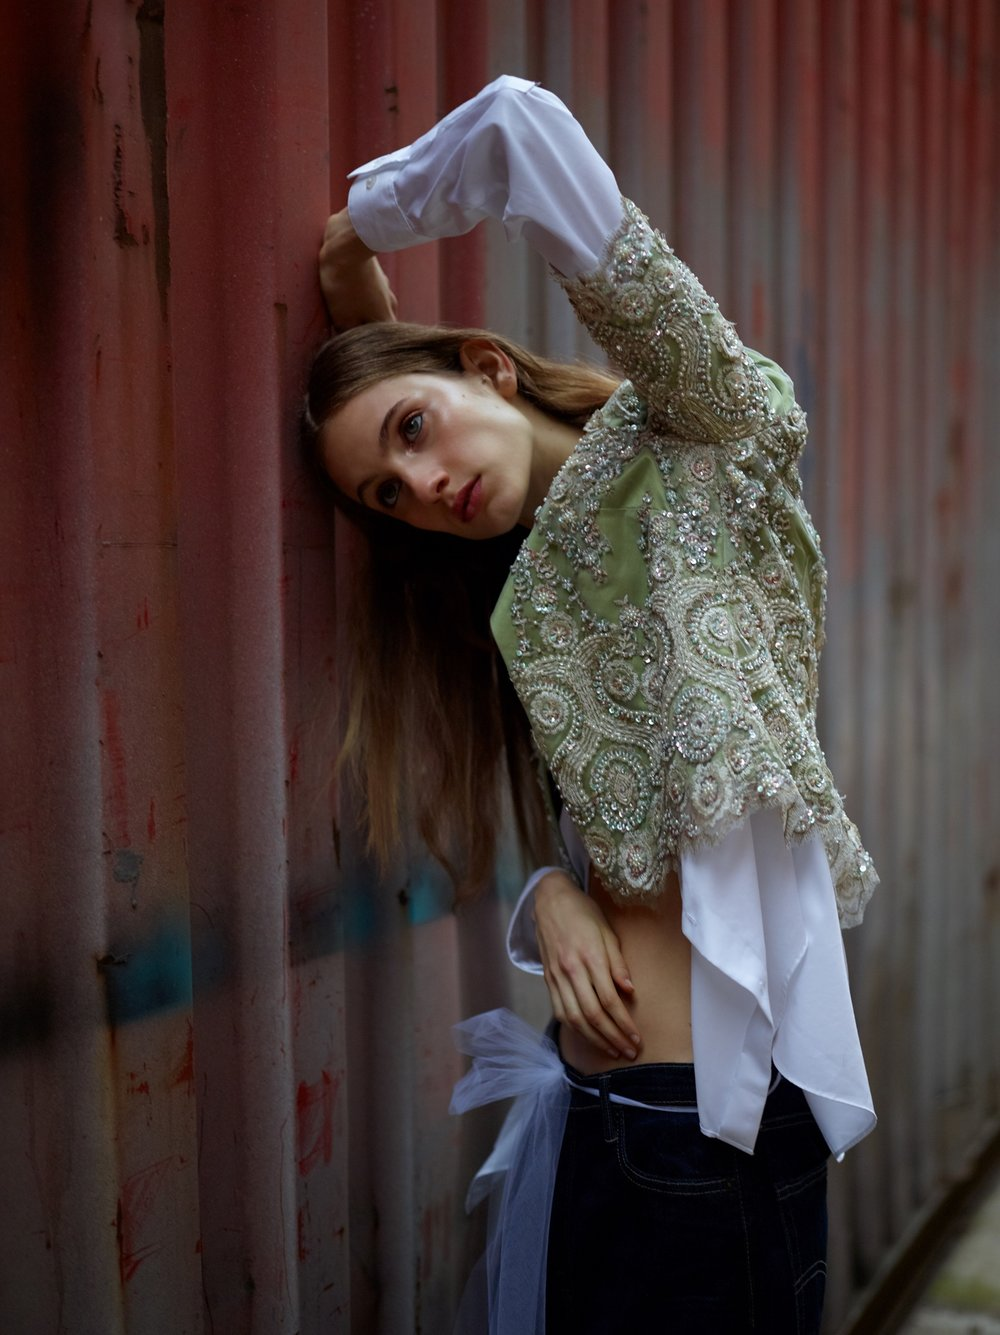 photographer. grayson and jamie hoffman  model. sarah berger @ women ny  makeup. david razzano  hair. wade lee